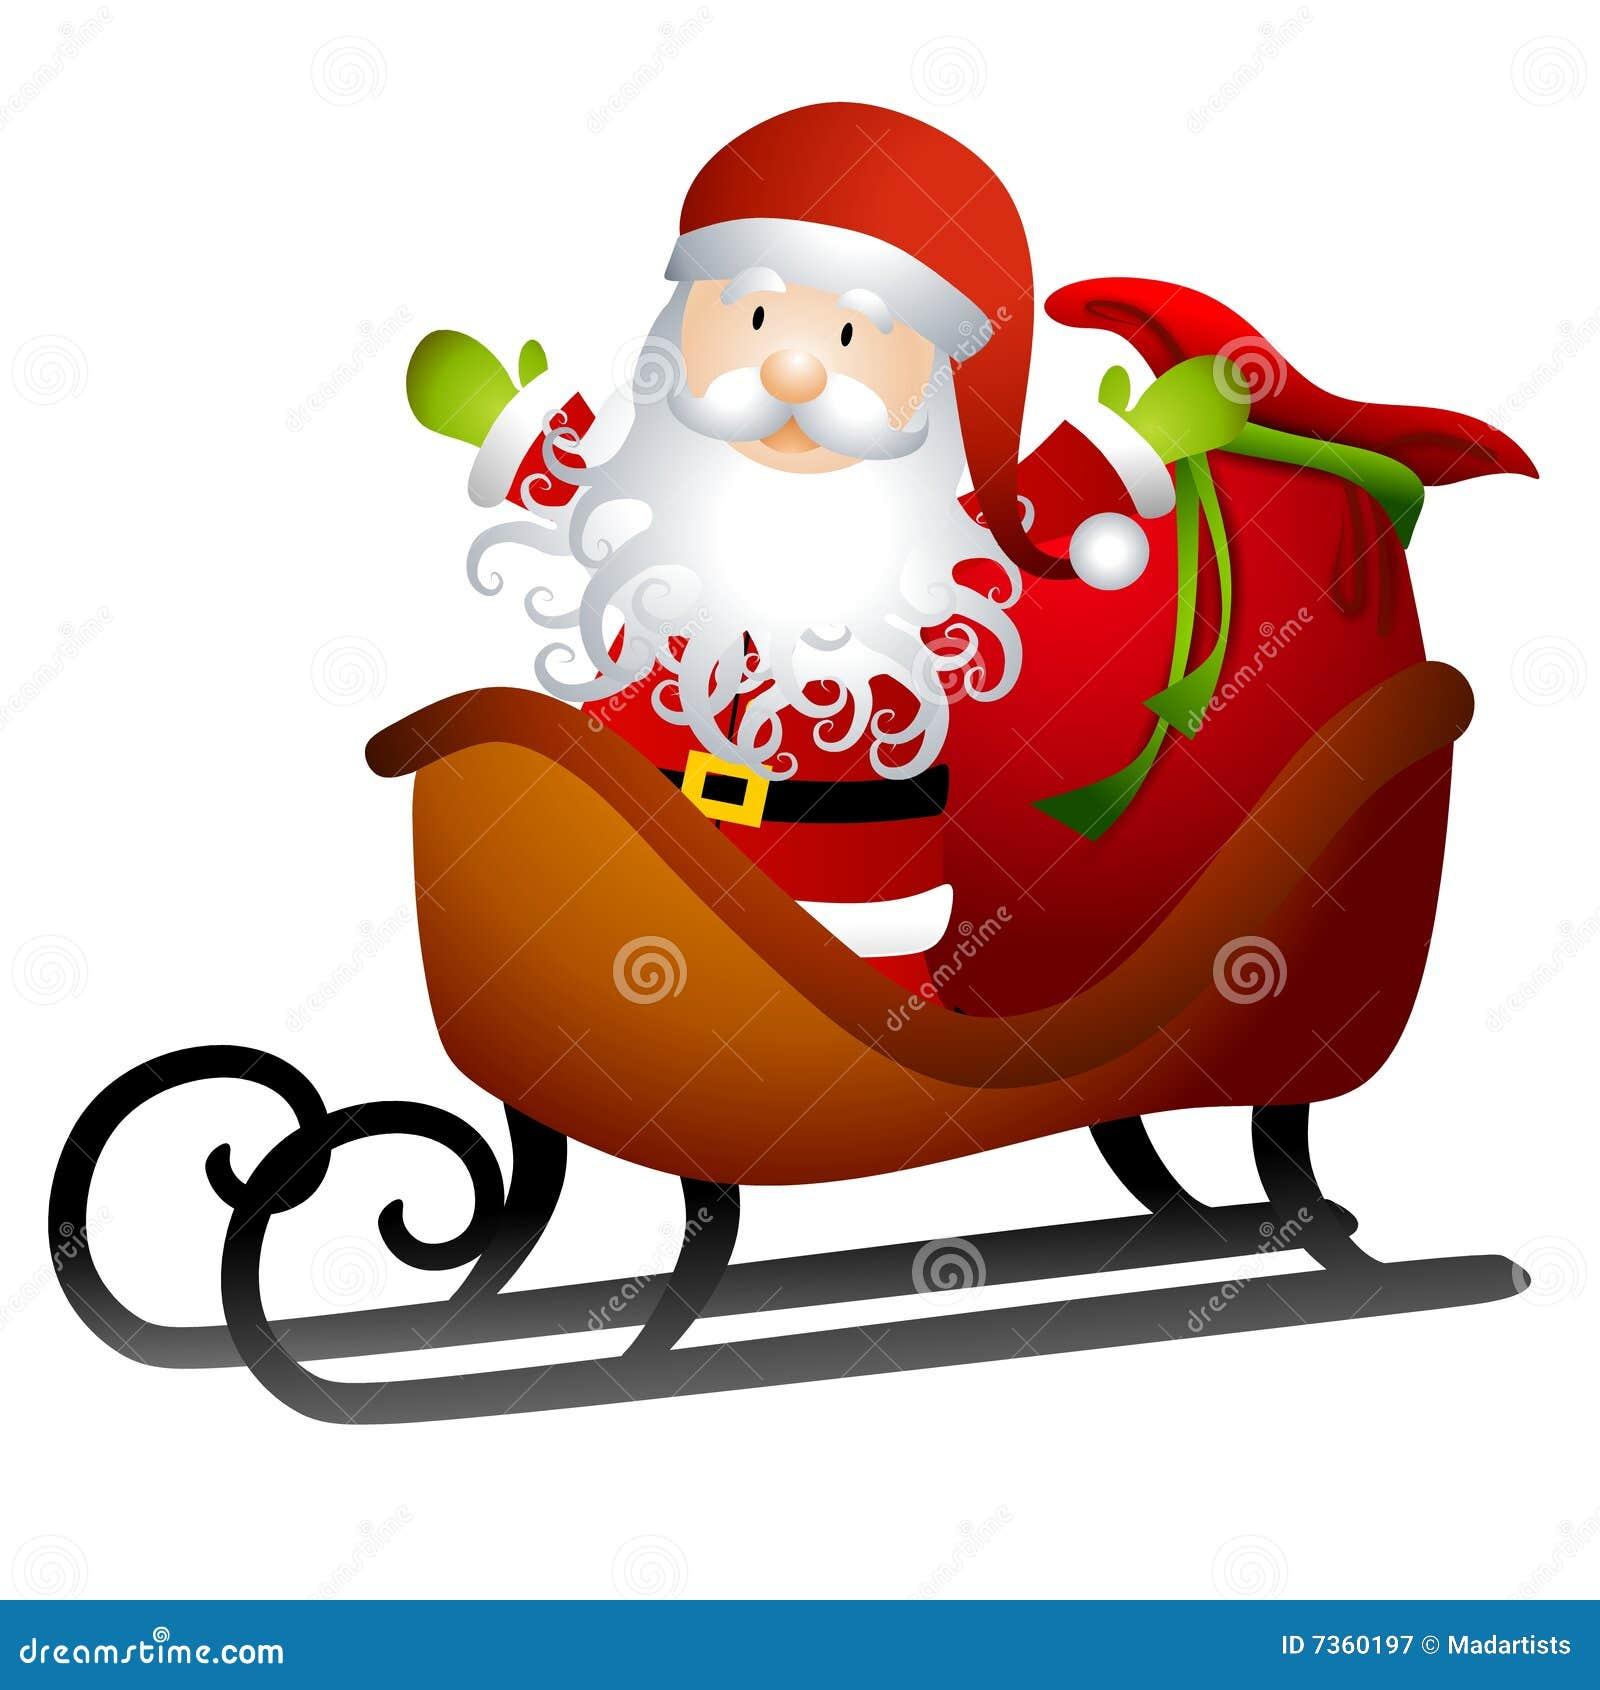 Cartoon Santa Sleigh Santa in sleigh of toys